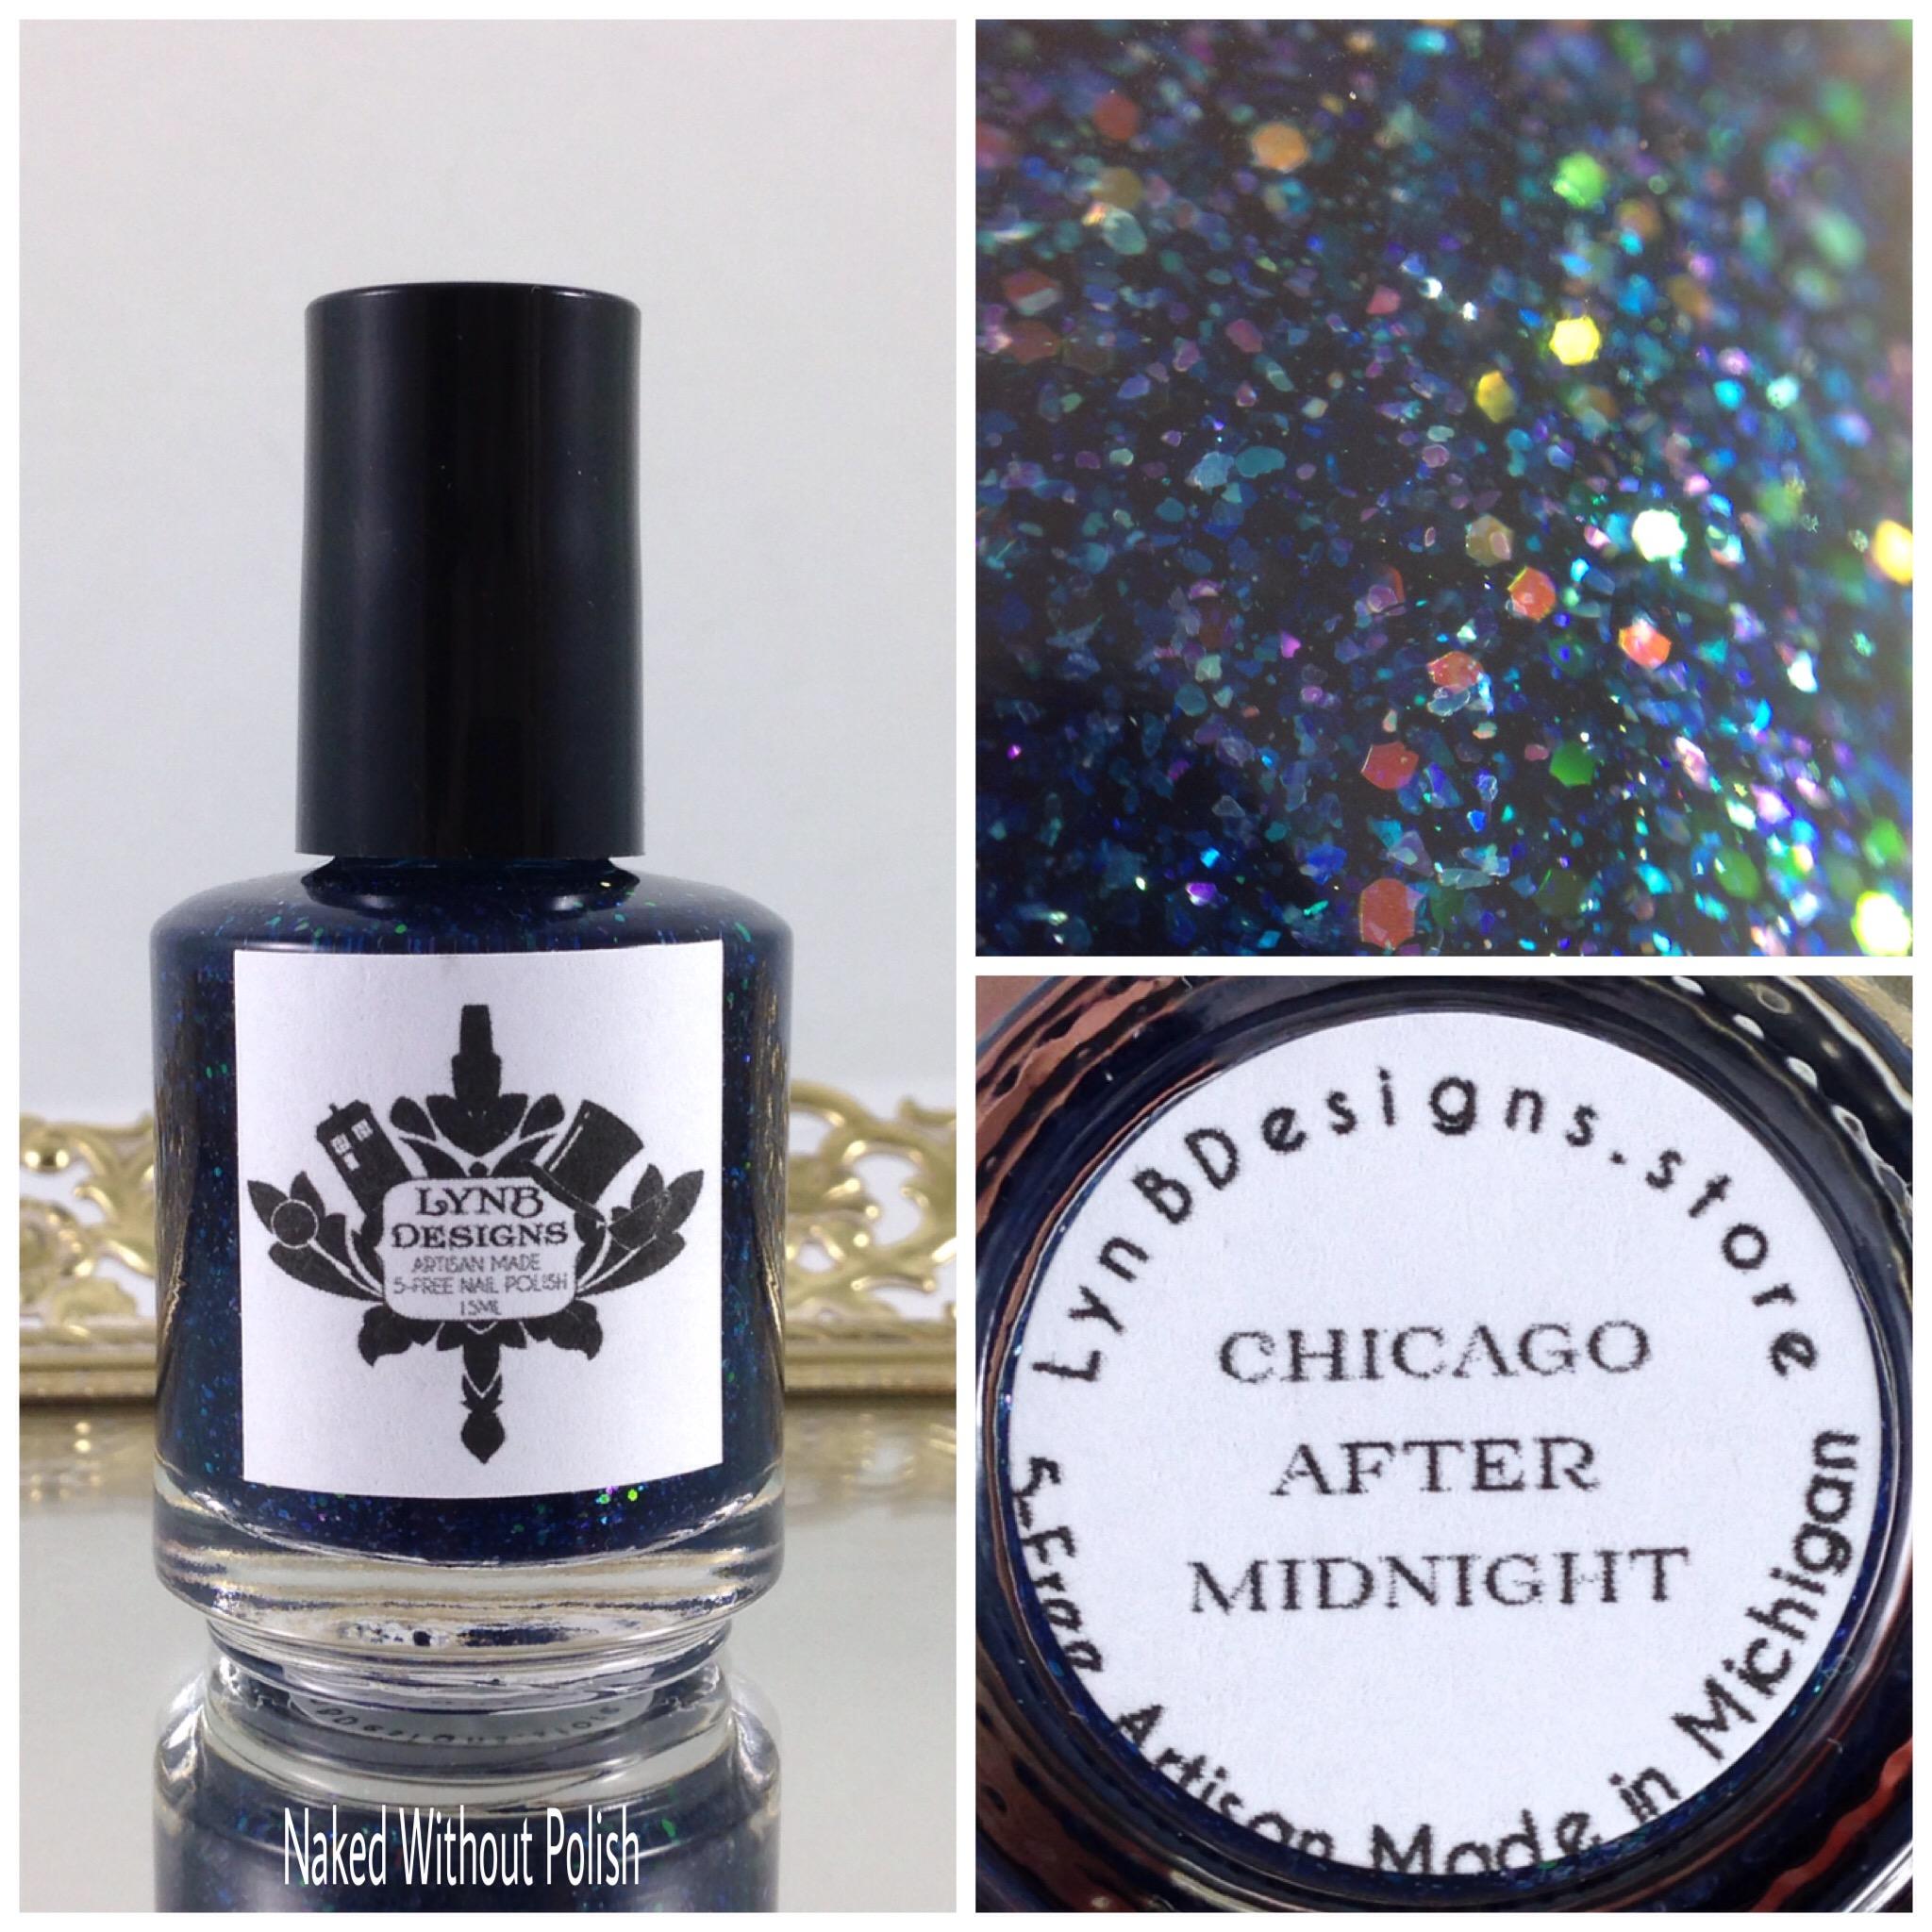 LynBDesigns-Polish-Con-Chicago-After-Midnight-1